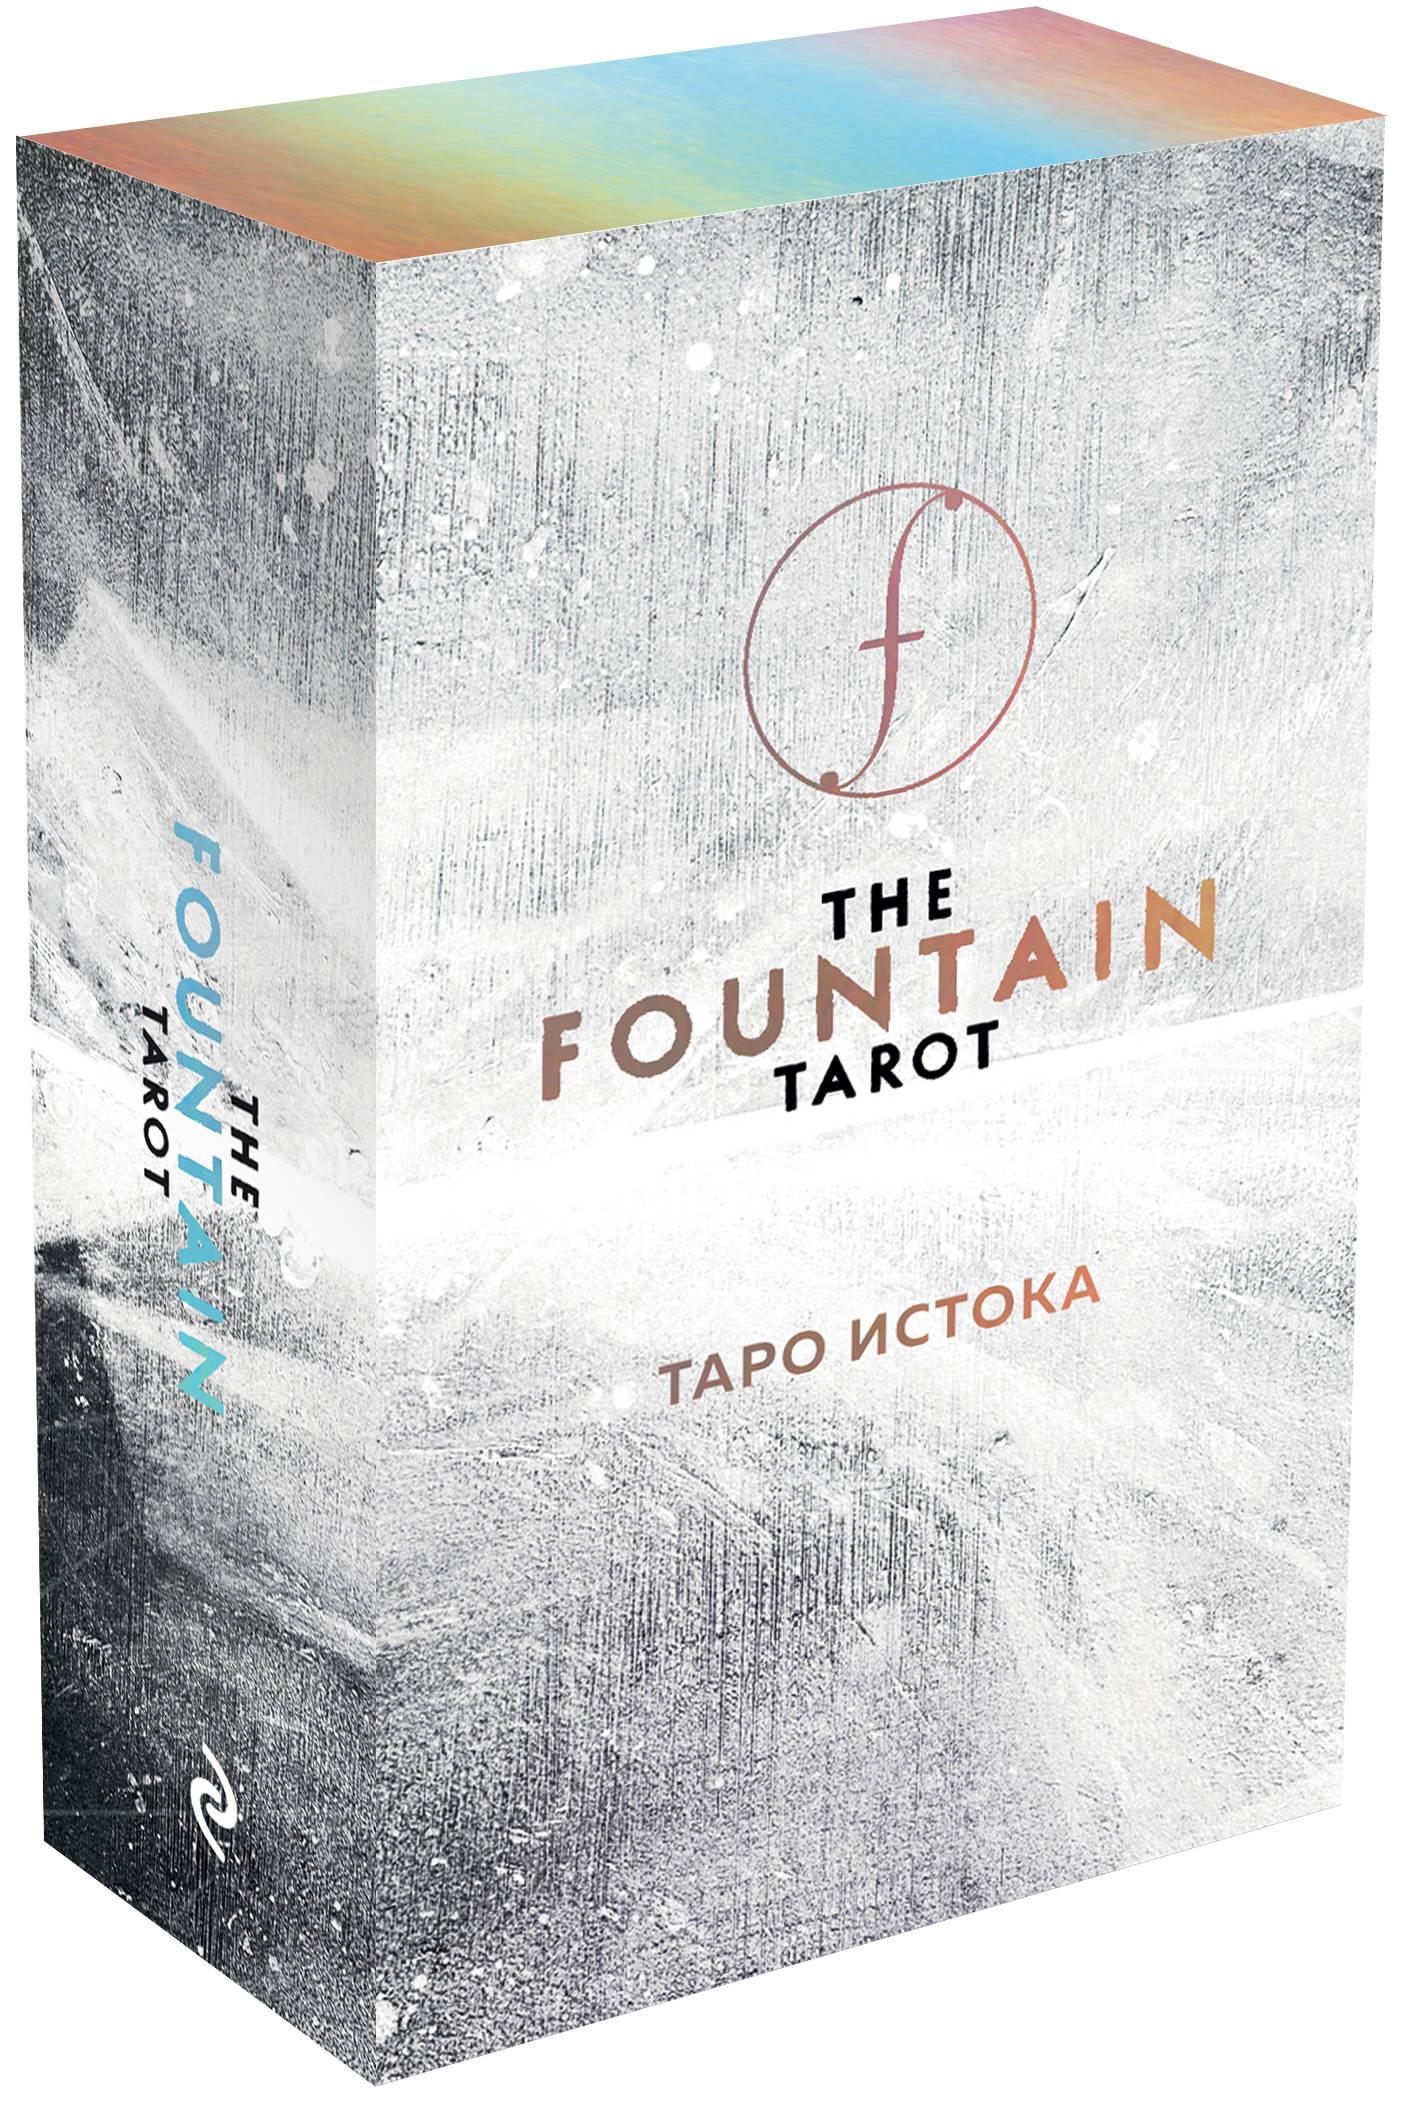 Джонатан Сайз, Джейсон Грул, Энди Тодаро The Fountain Tarot. Таро Истока (80 карт и руководство в подарочном футляре) цены